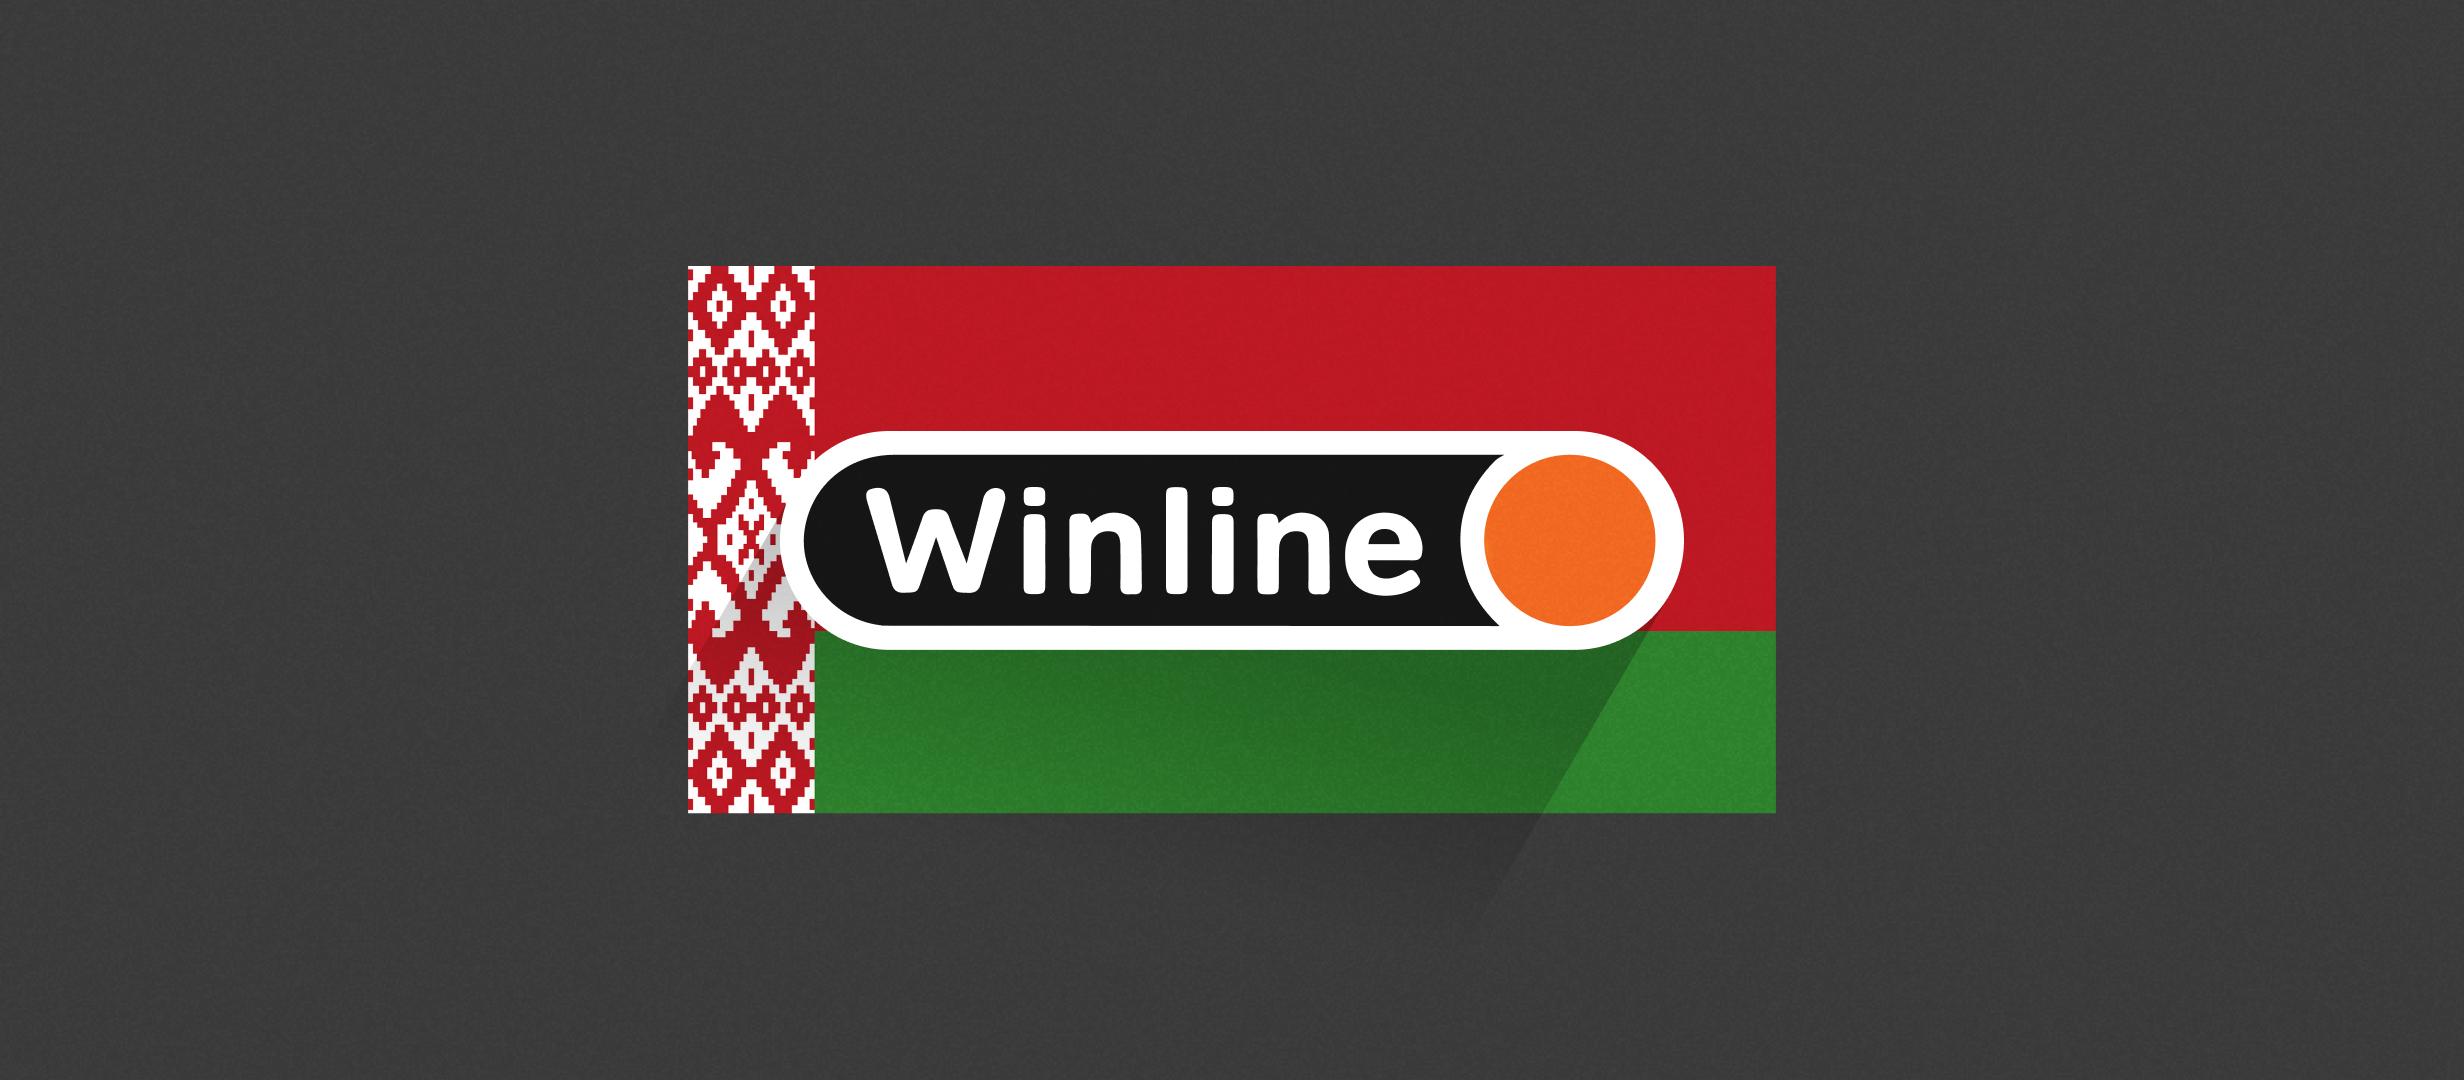 БК Winline начала работу на территории Беларуси